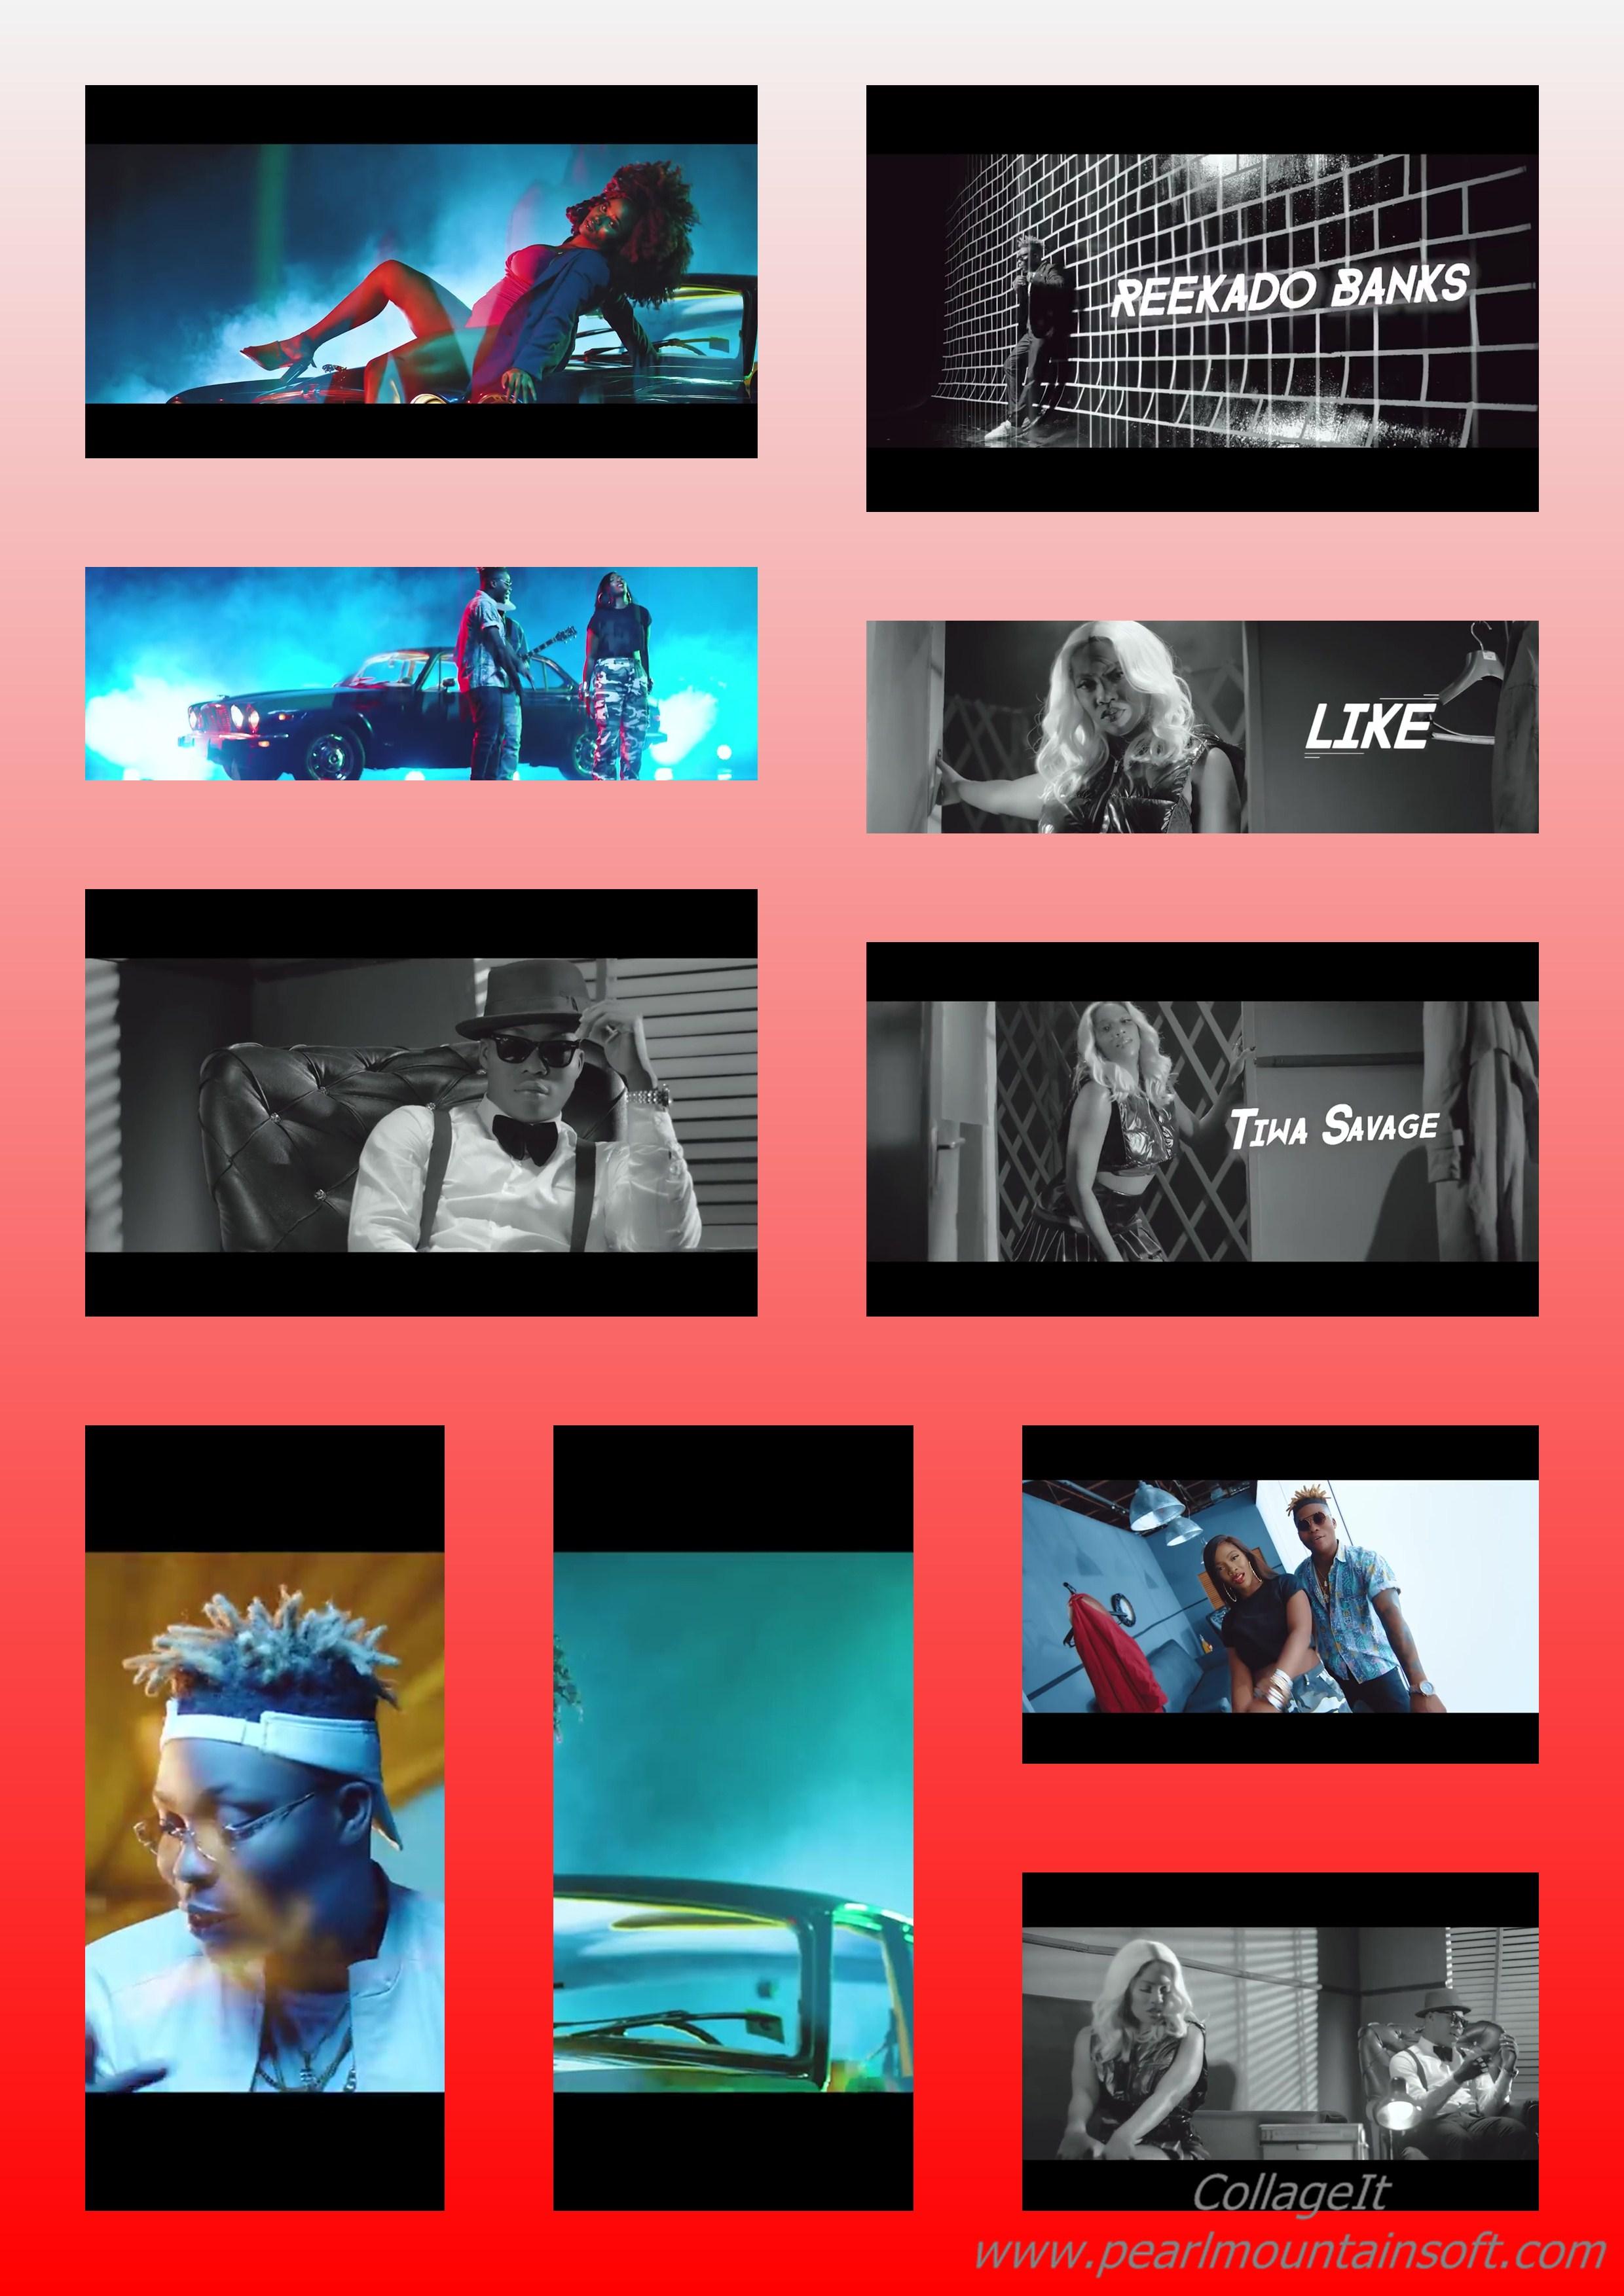 "(+LYRICS + TRANSLATION + MEANING) MUSIC REVIEW: LIKE BY REEKADO BANKS FT TIWA SAVAGE AND FIOKEE ""I TOLD YOU…"""